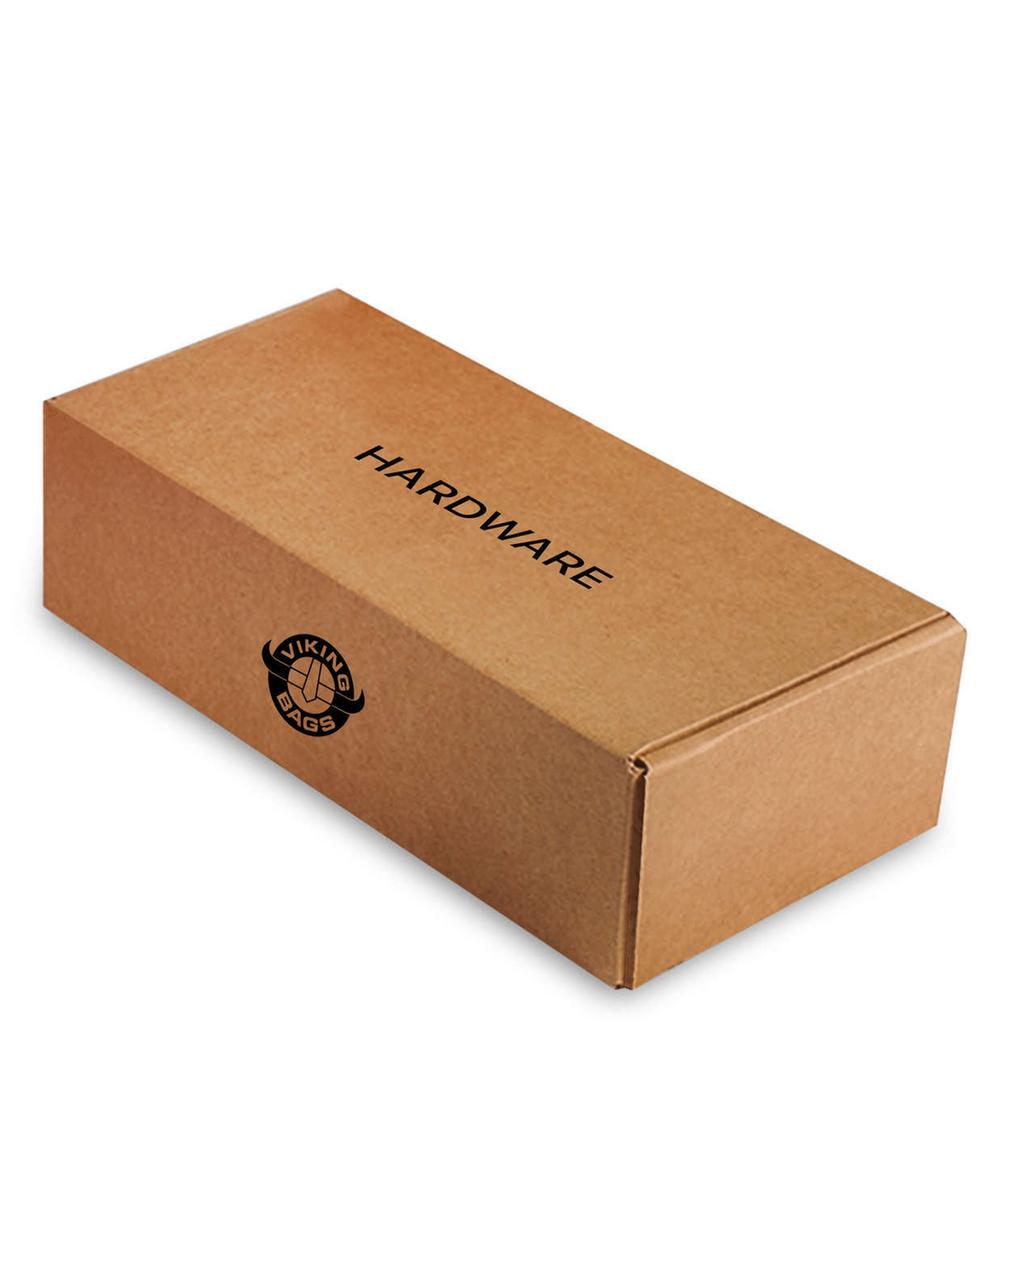 Honda VTX 1800 S Pinnacle Motorcycle Saddlebags Box